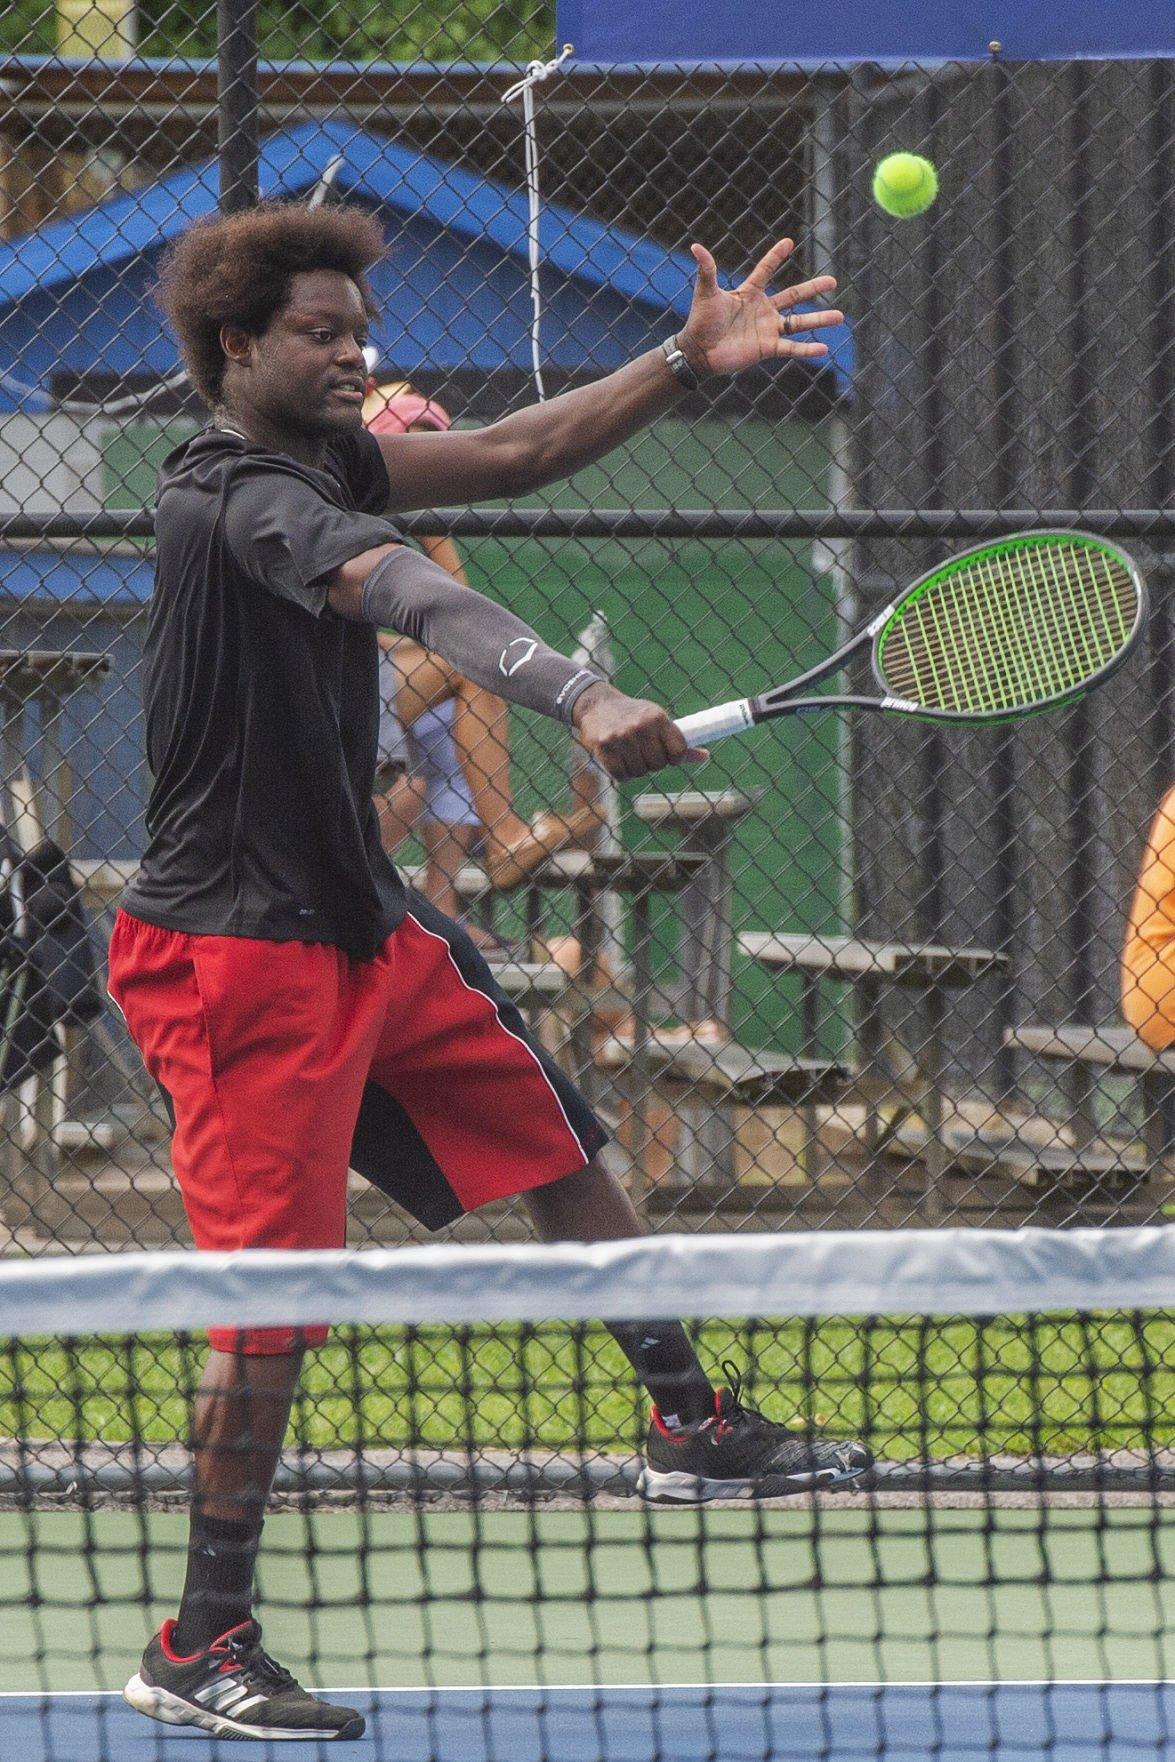 spt_tennis